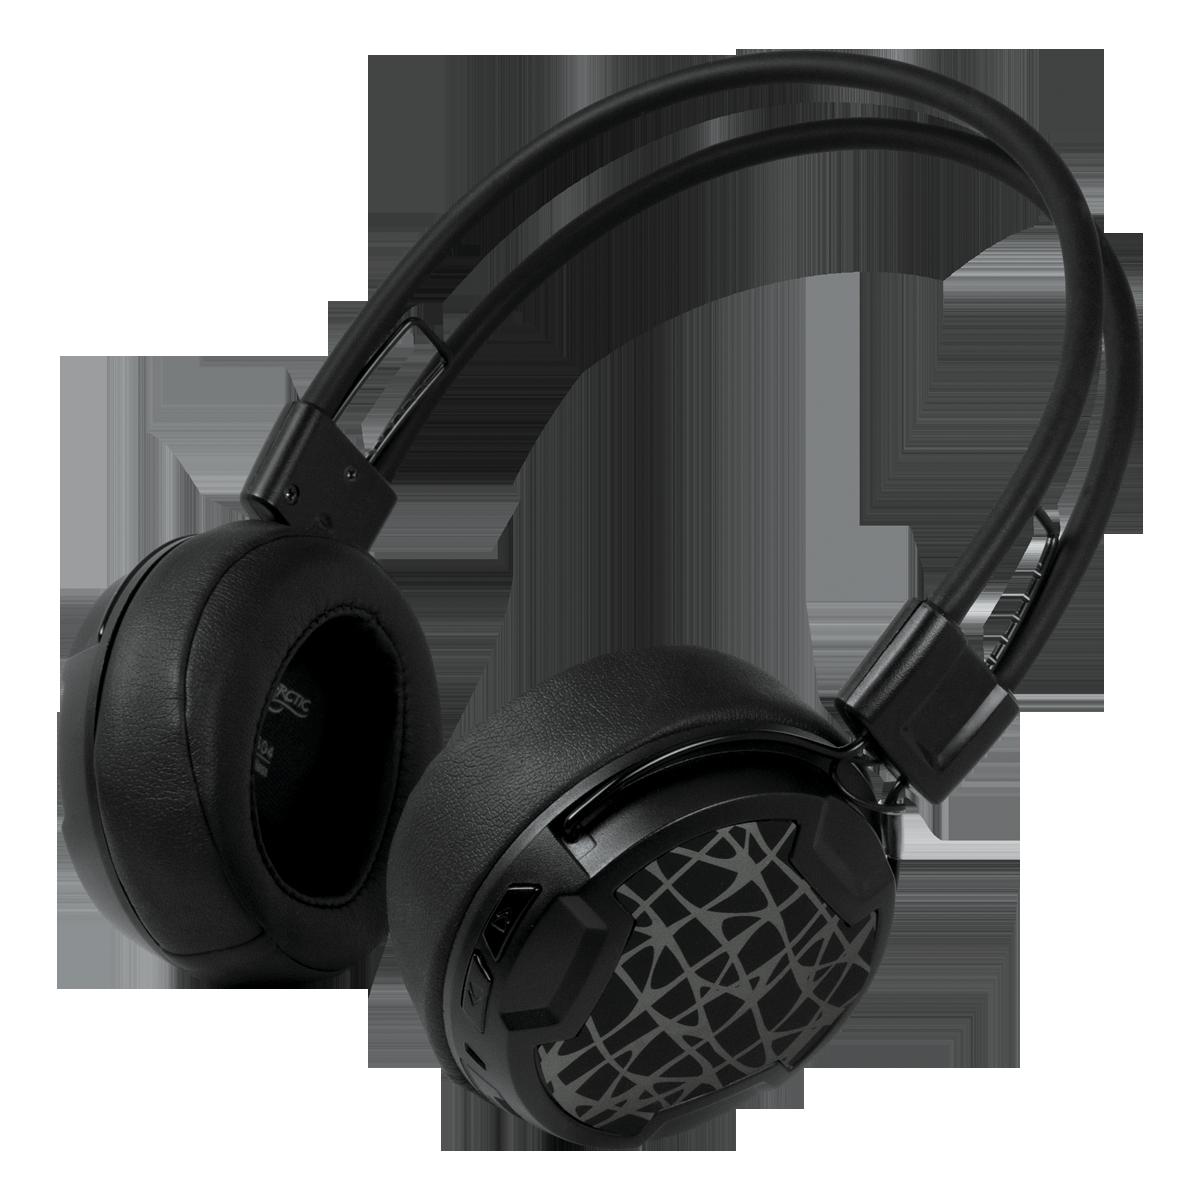 Headphone clipart bluetooth headphone. Arctic p wireless dynamic